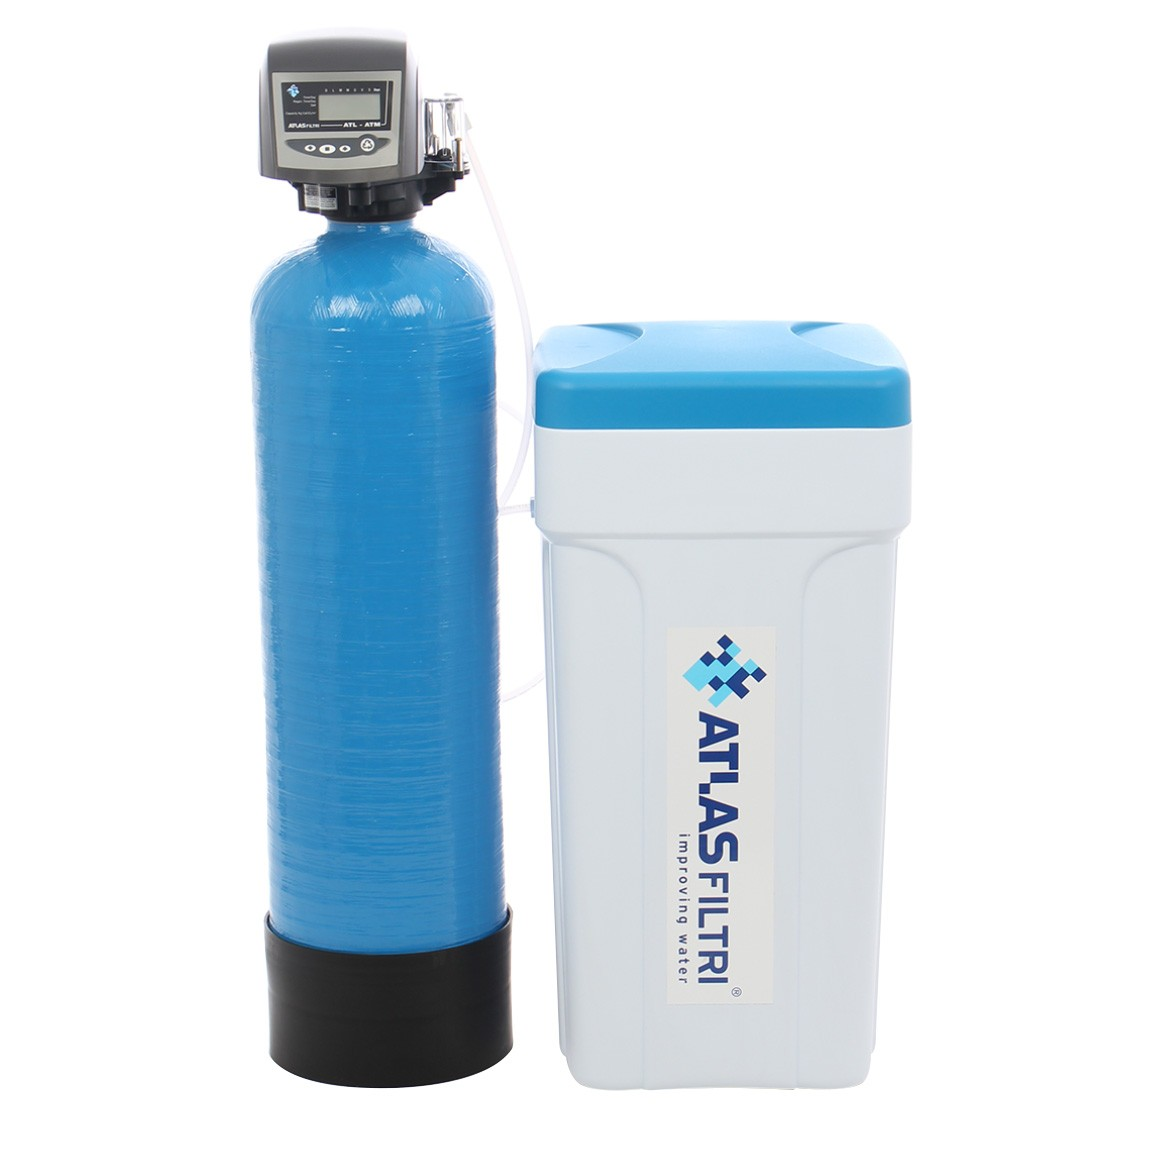 Atlas Filtri změkčovač vody JUPITER 10 ATL